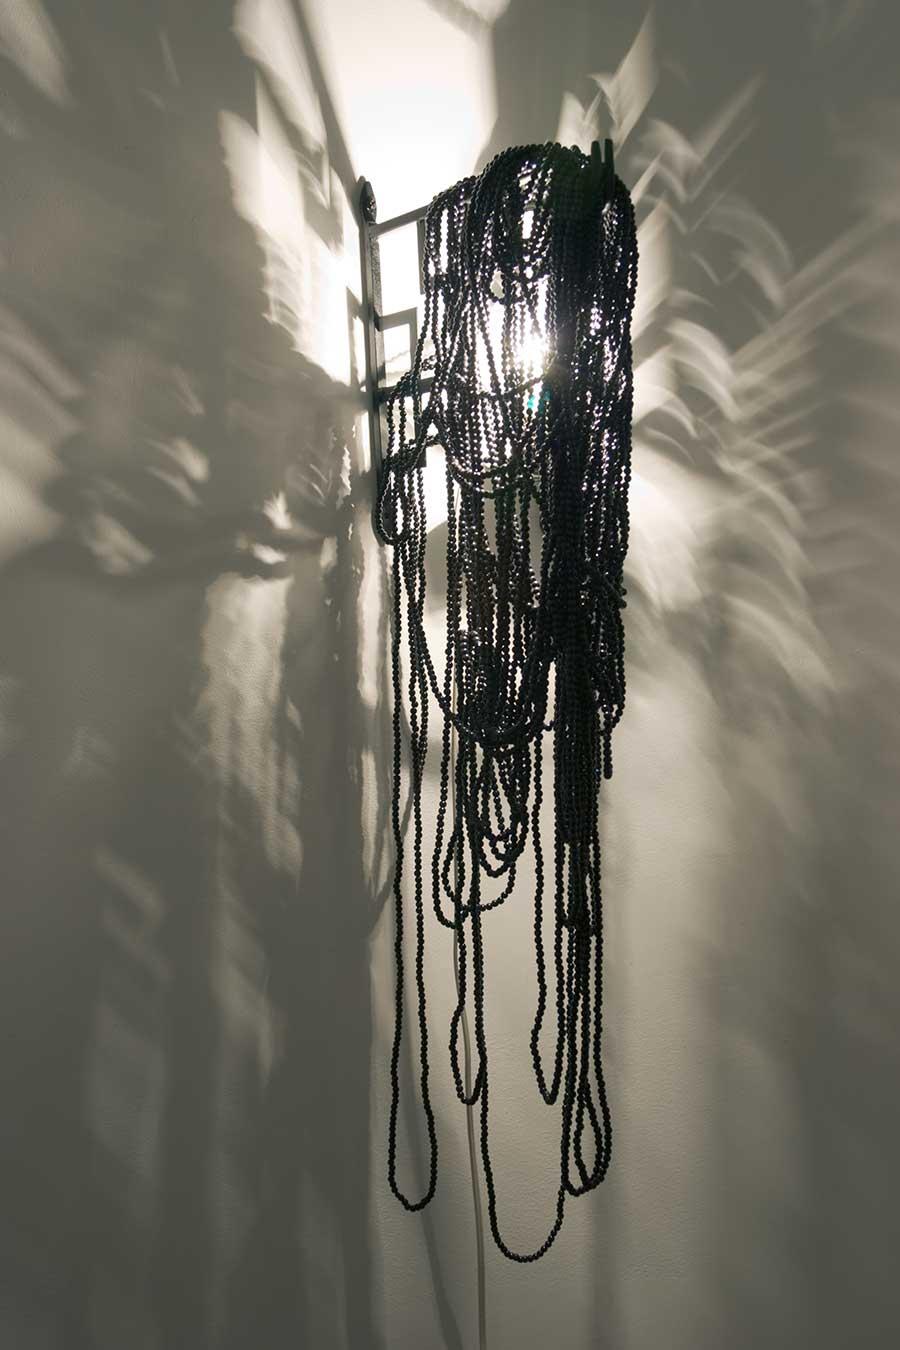 A Tavola Series: Black Beads